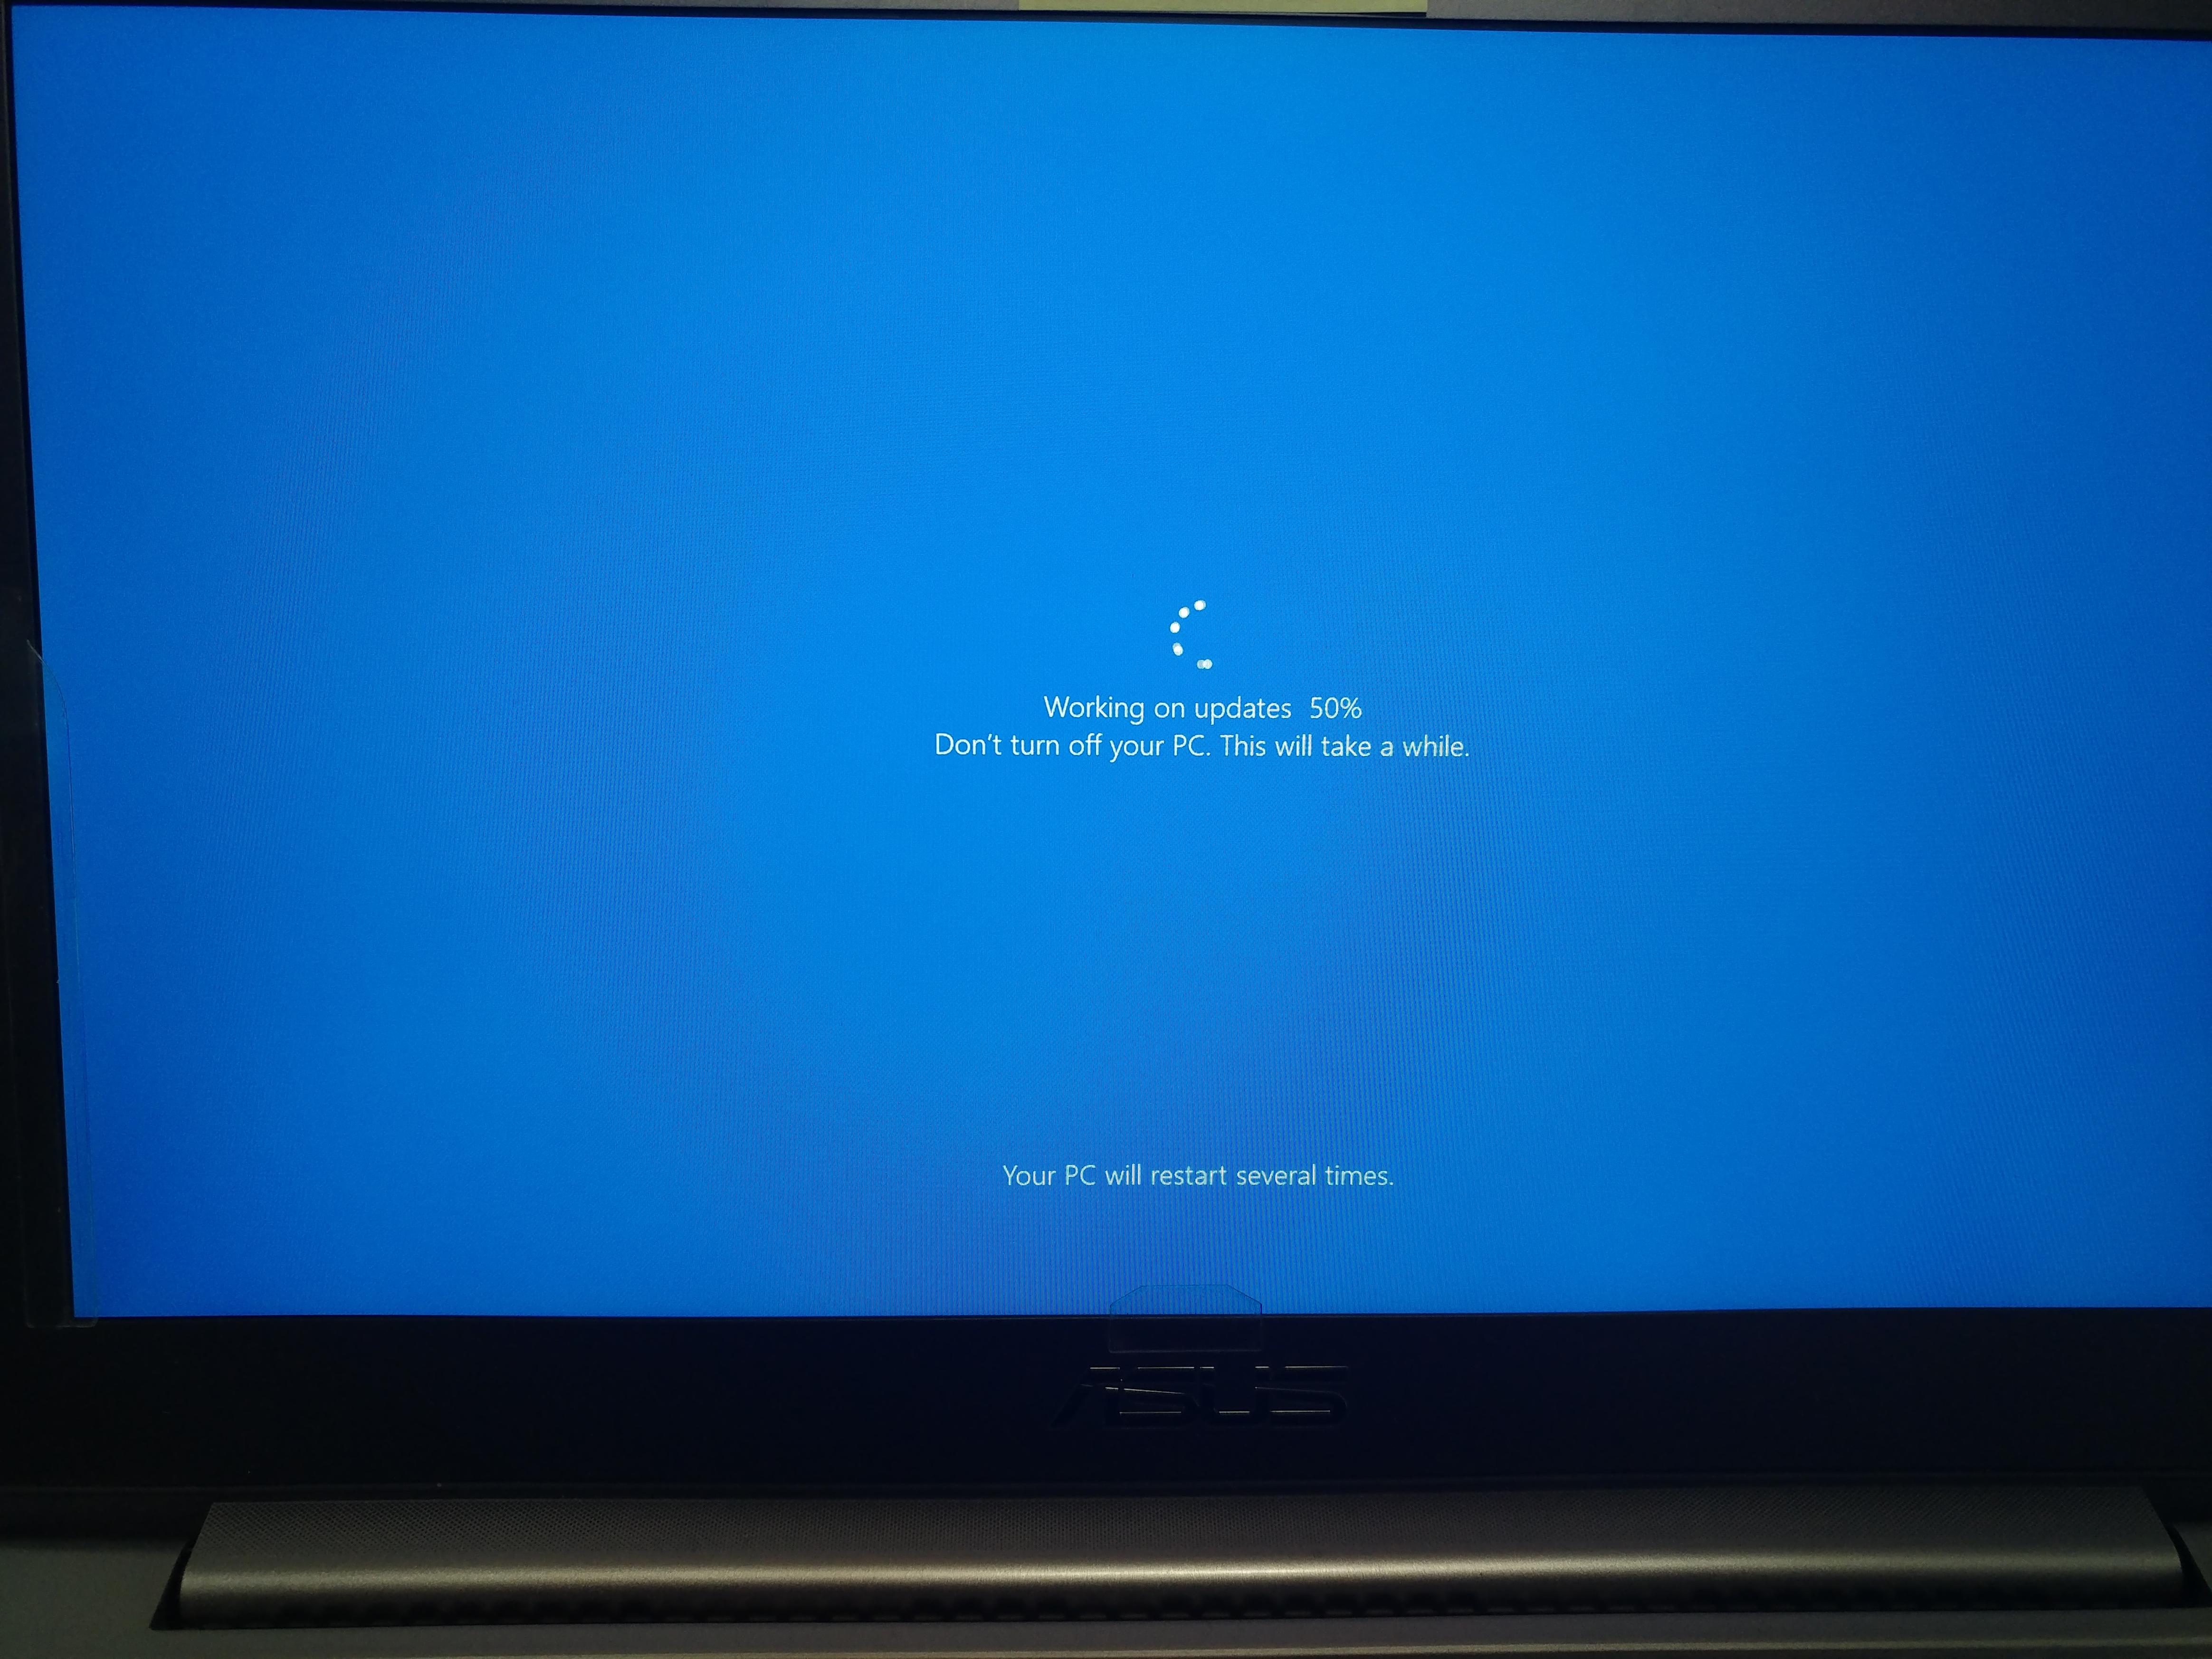 installing windows 10 updates